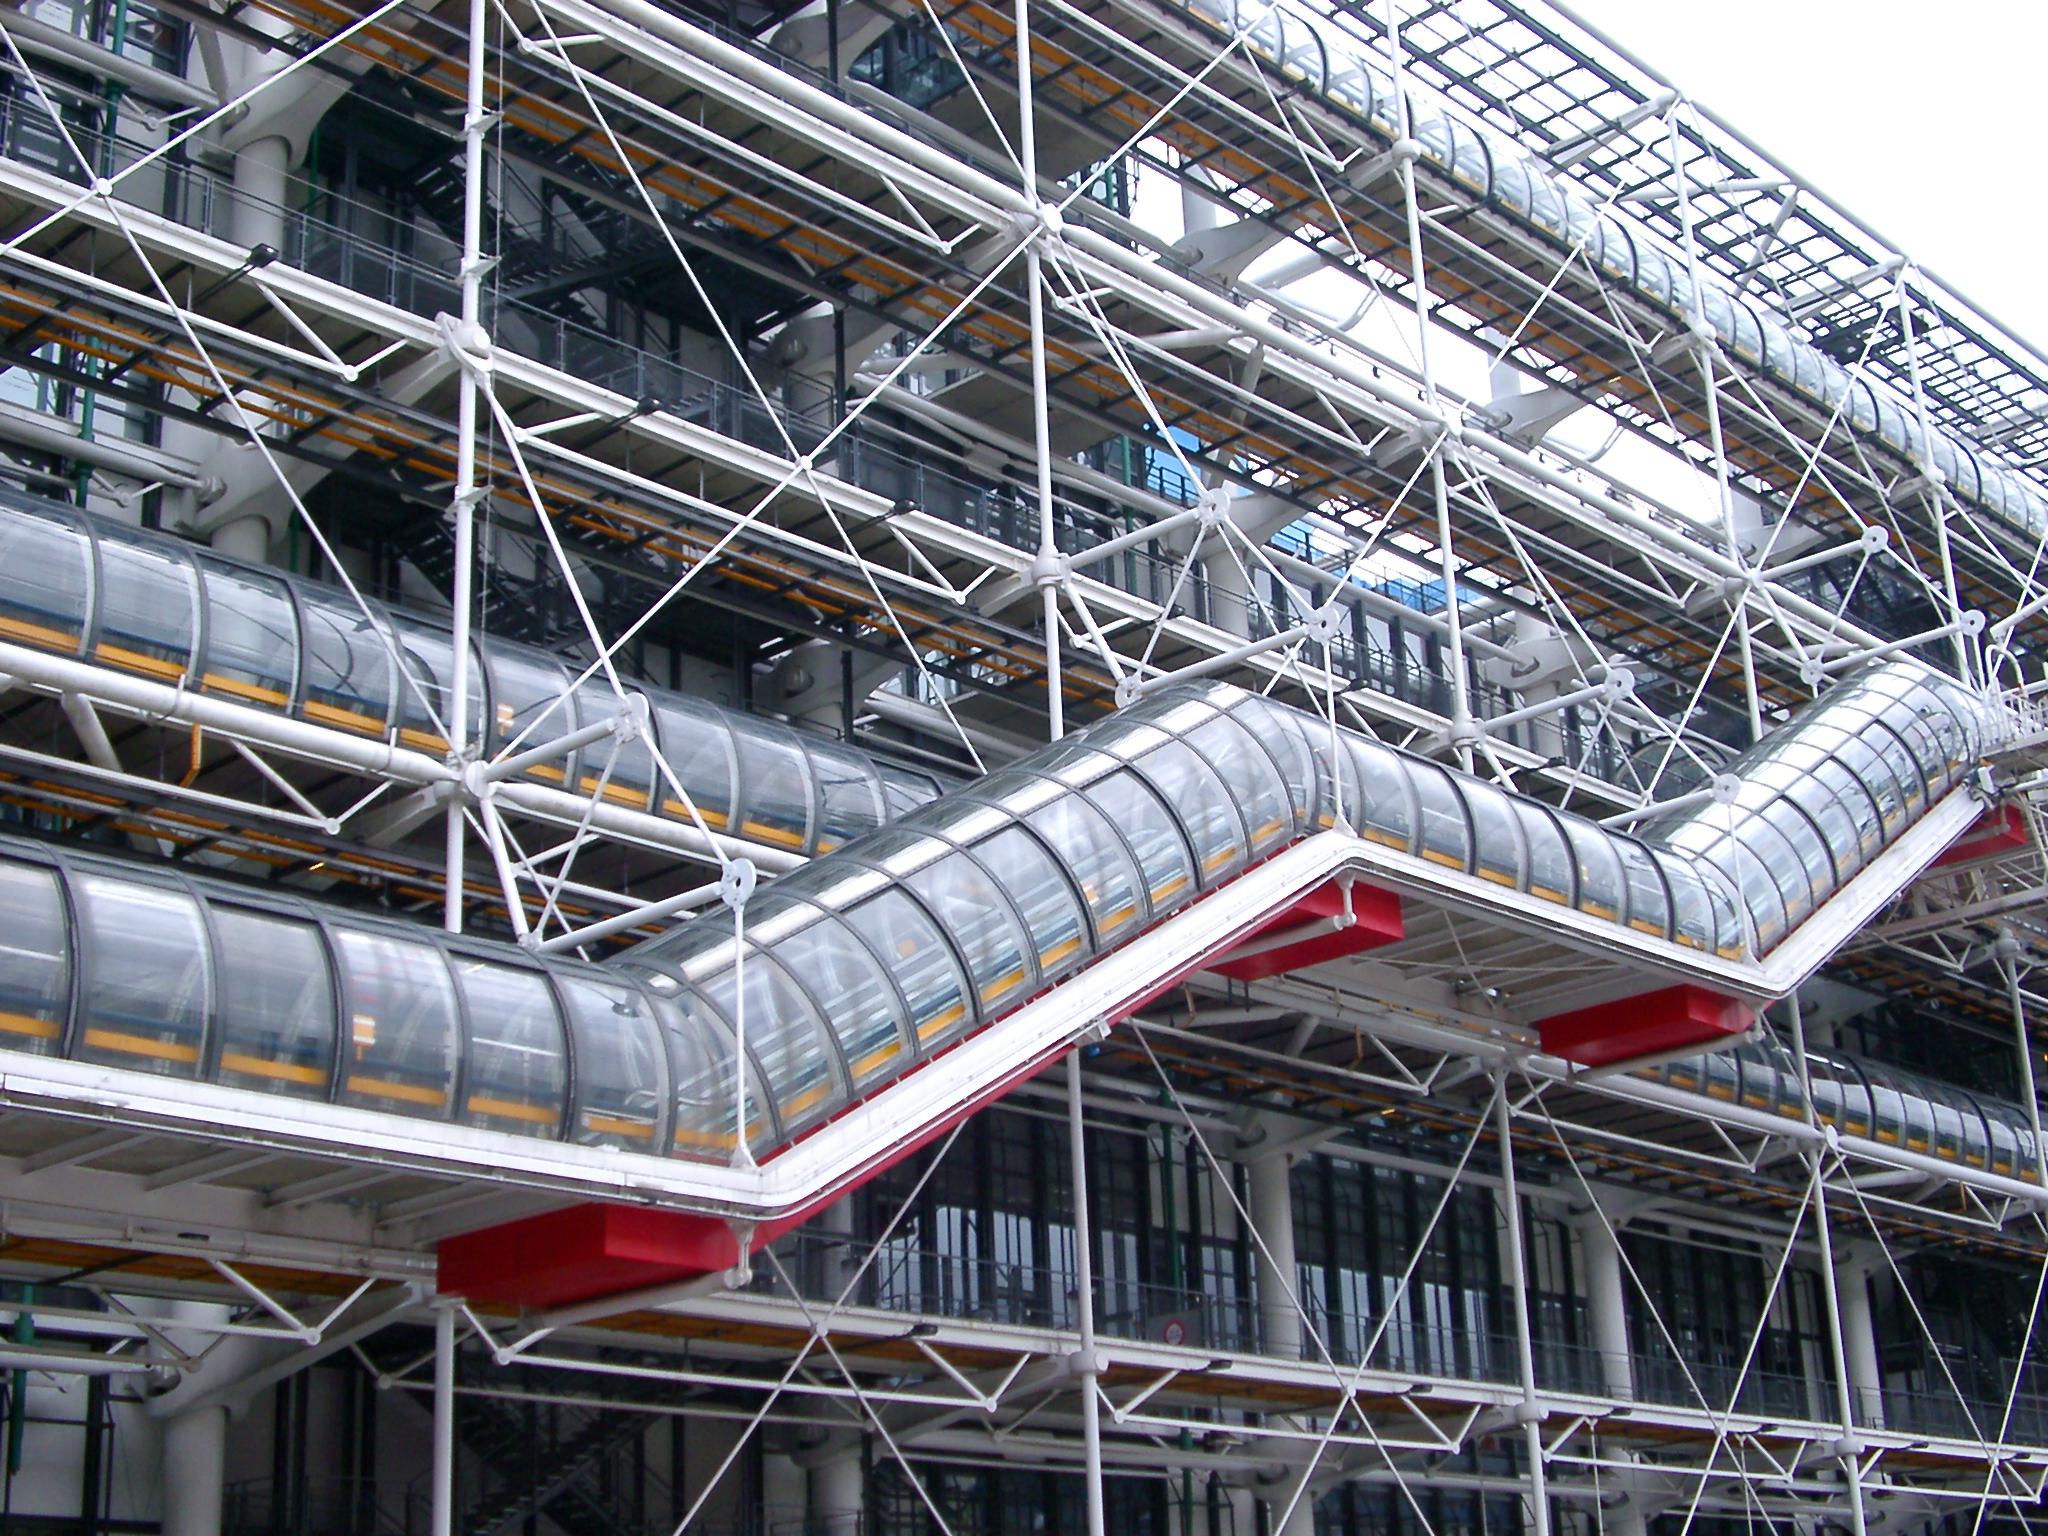 High Tech Architektur: Centre Pompidou: 6 Redenen Waarom Je Ervan Zal Houden